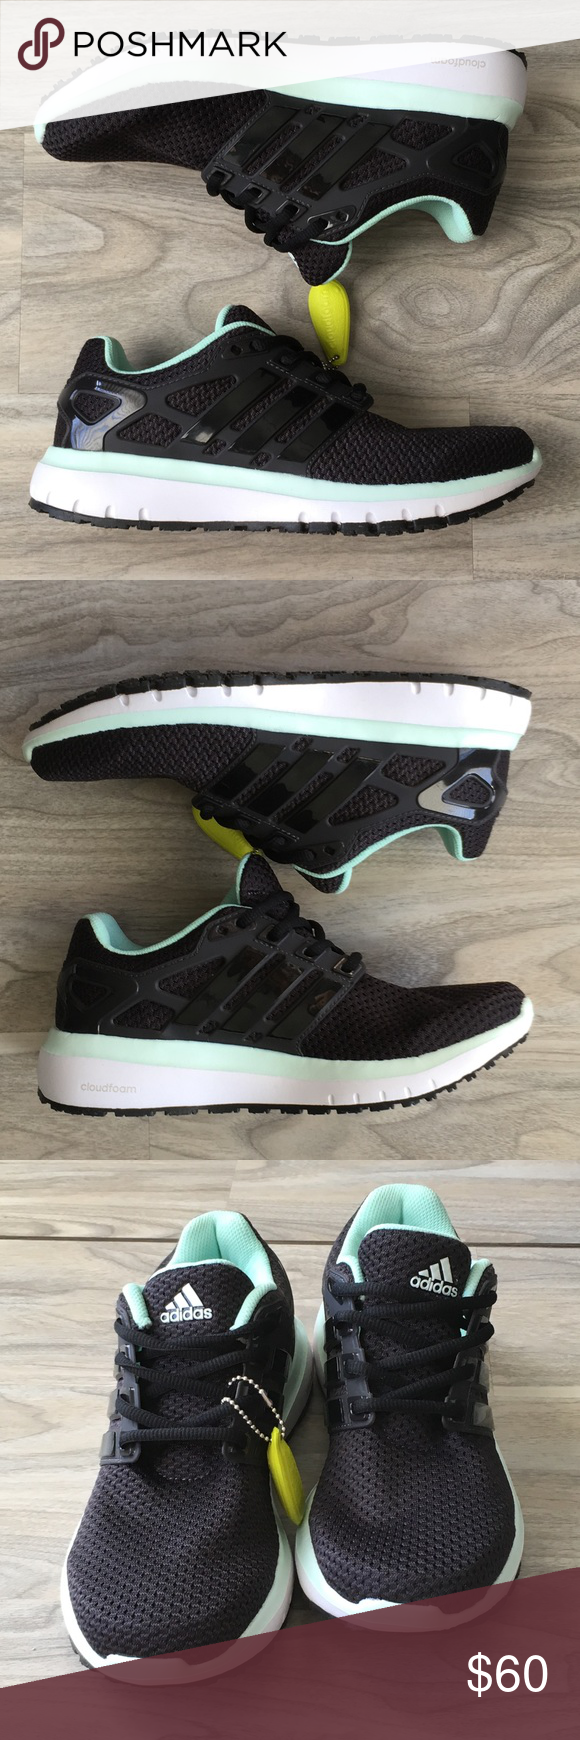 adidas nero blu nuvola di energia le scarpe da ginnastica nwt mint colore, adidas